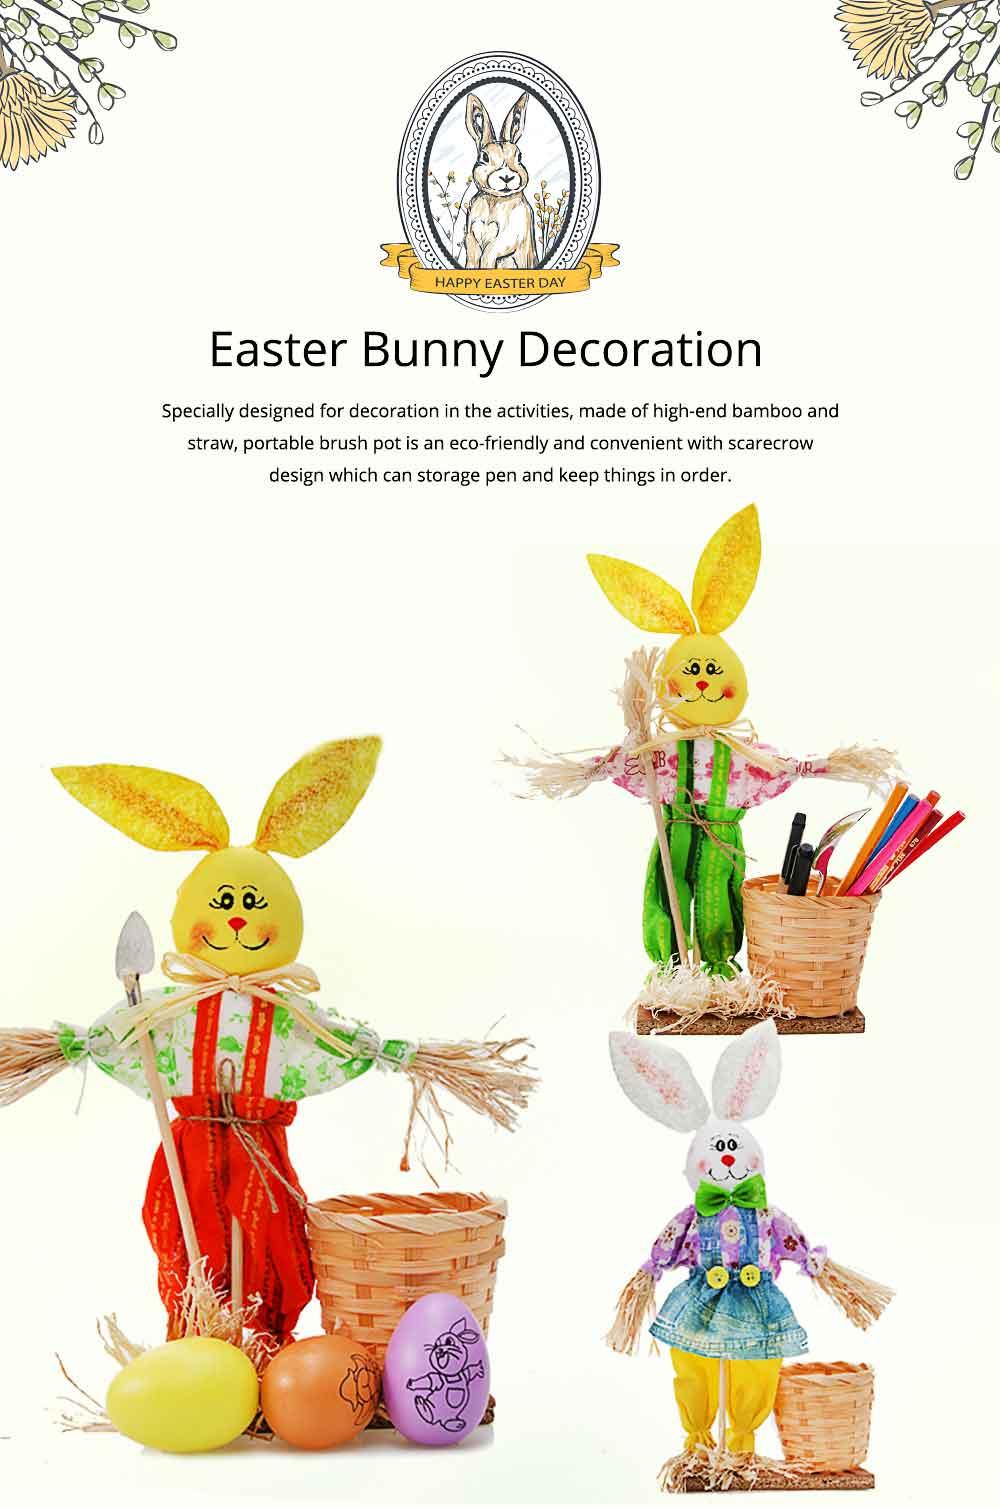 Easter Bunny Decorates as Brush Pot with Cute Rabbit Scarecrow Design, Kindergarten Gift 0